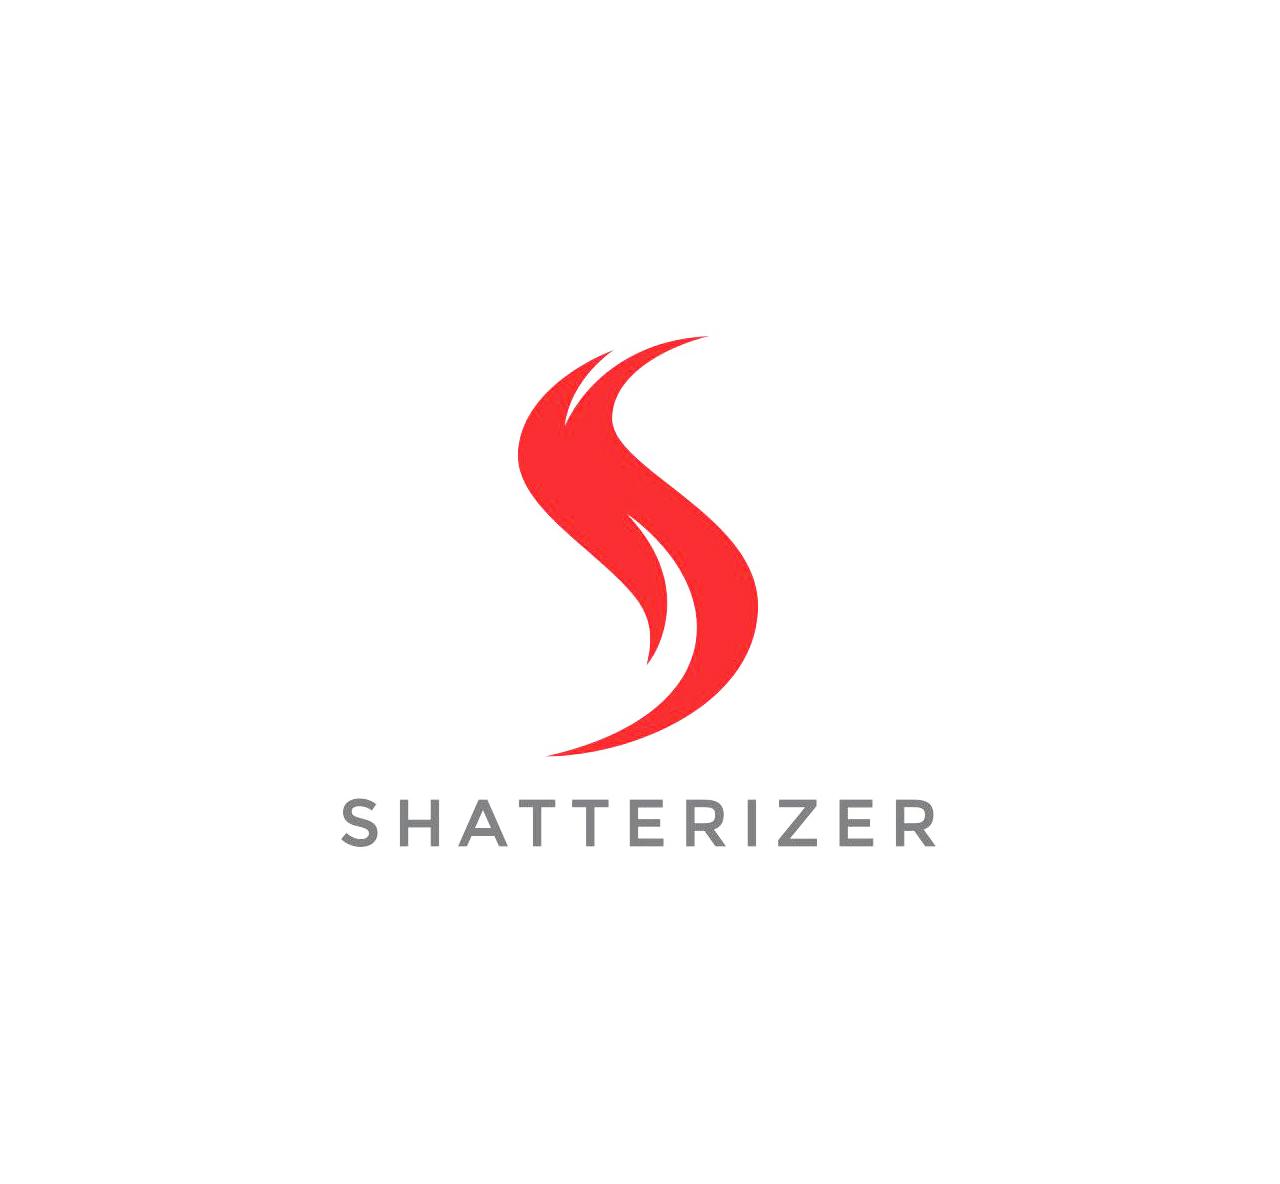 logo shatterizer edited